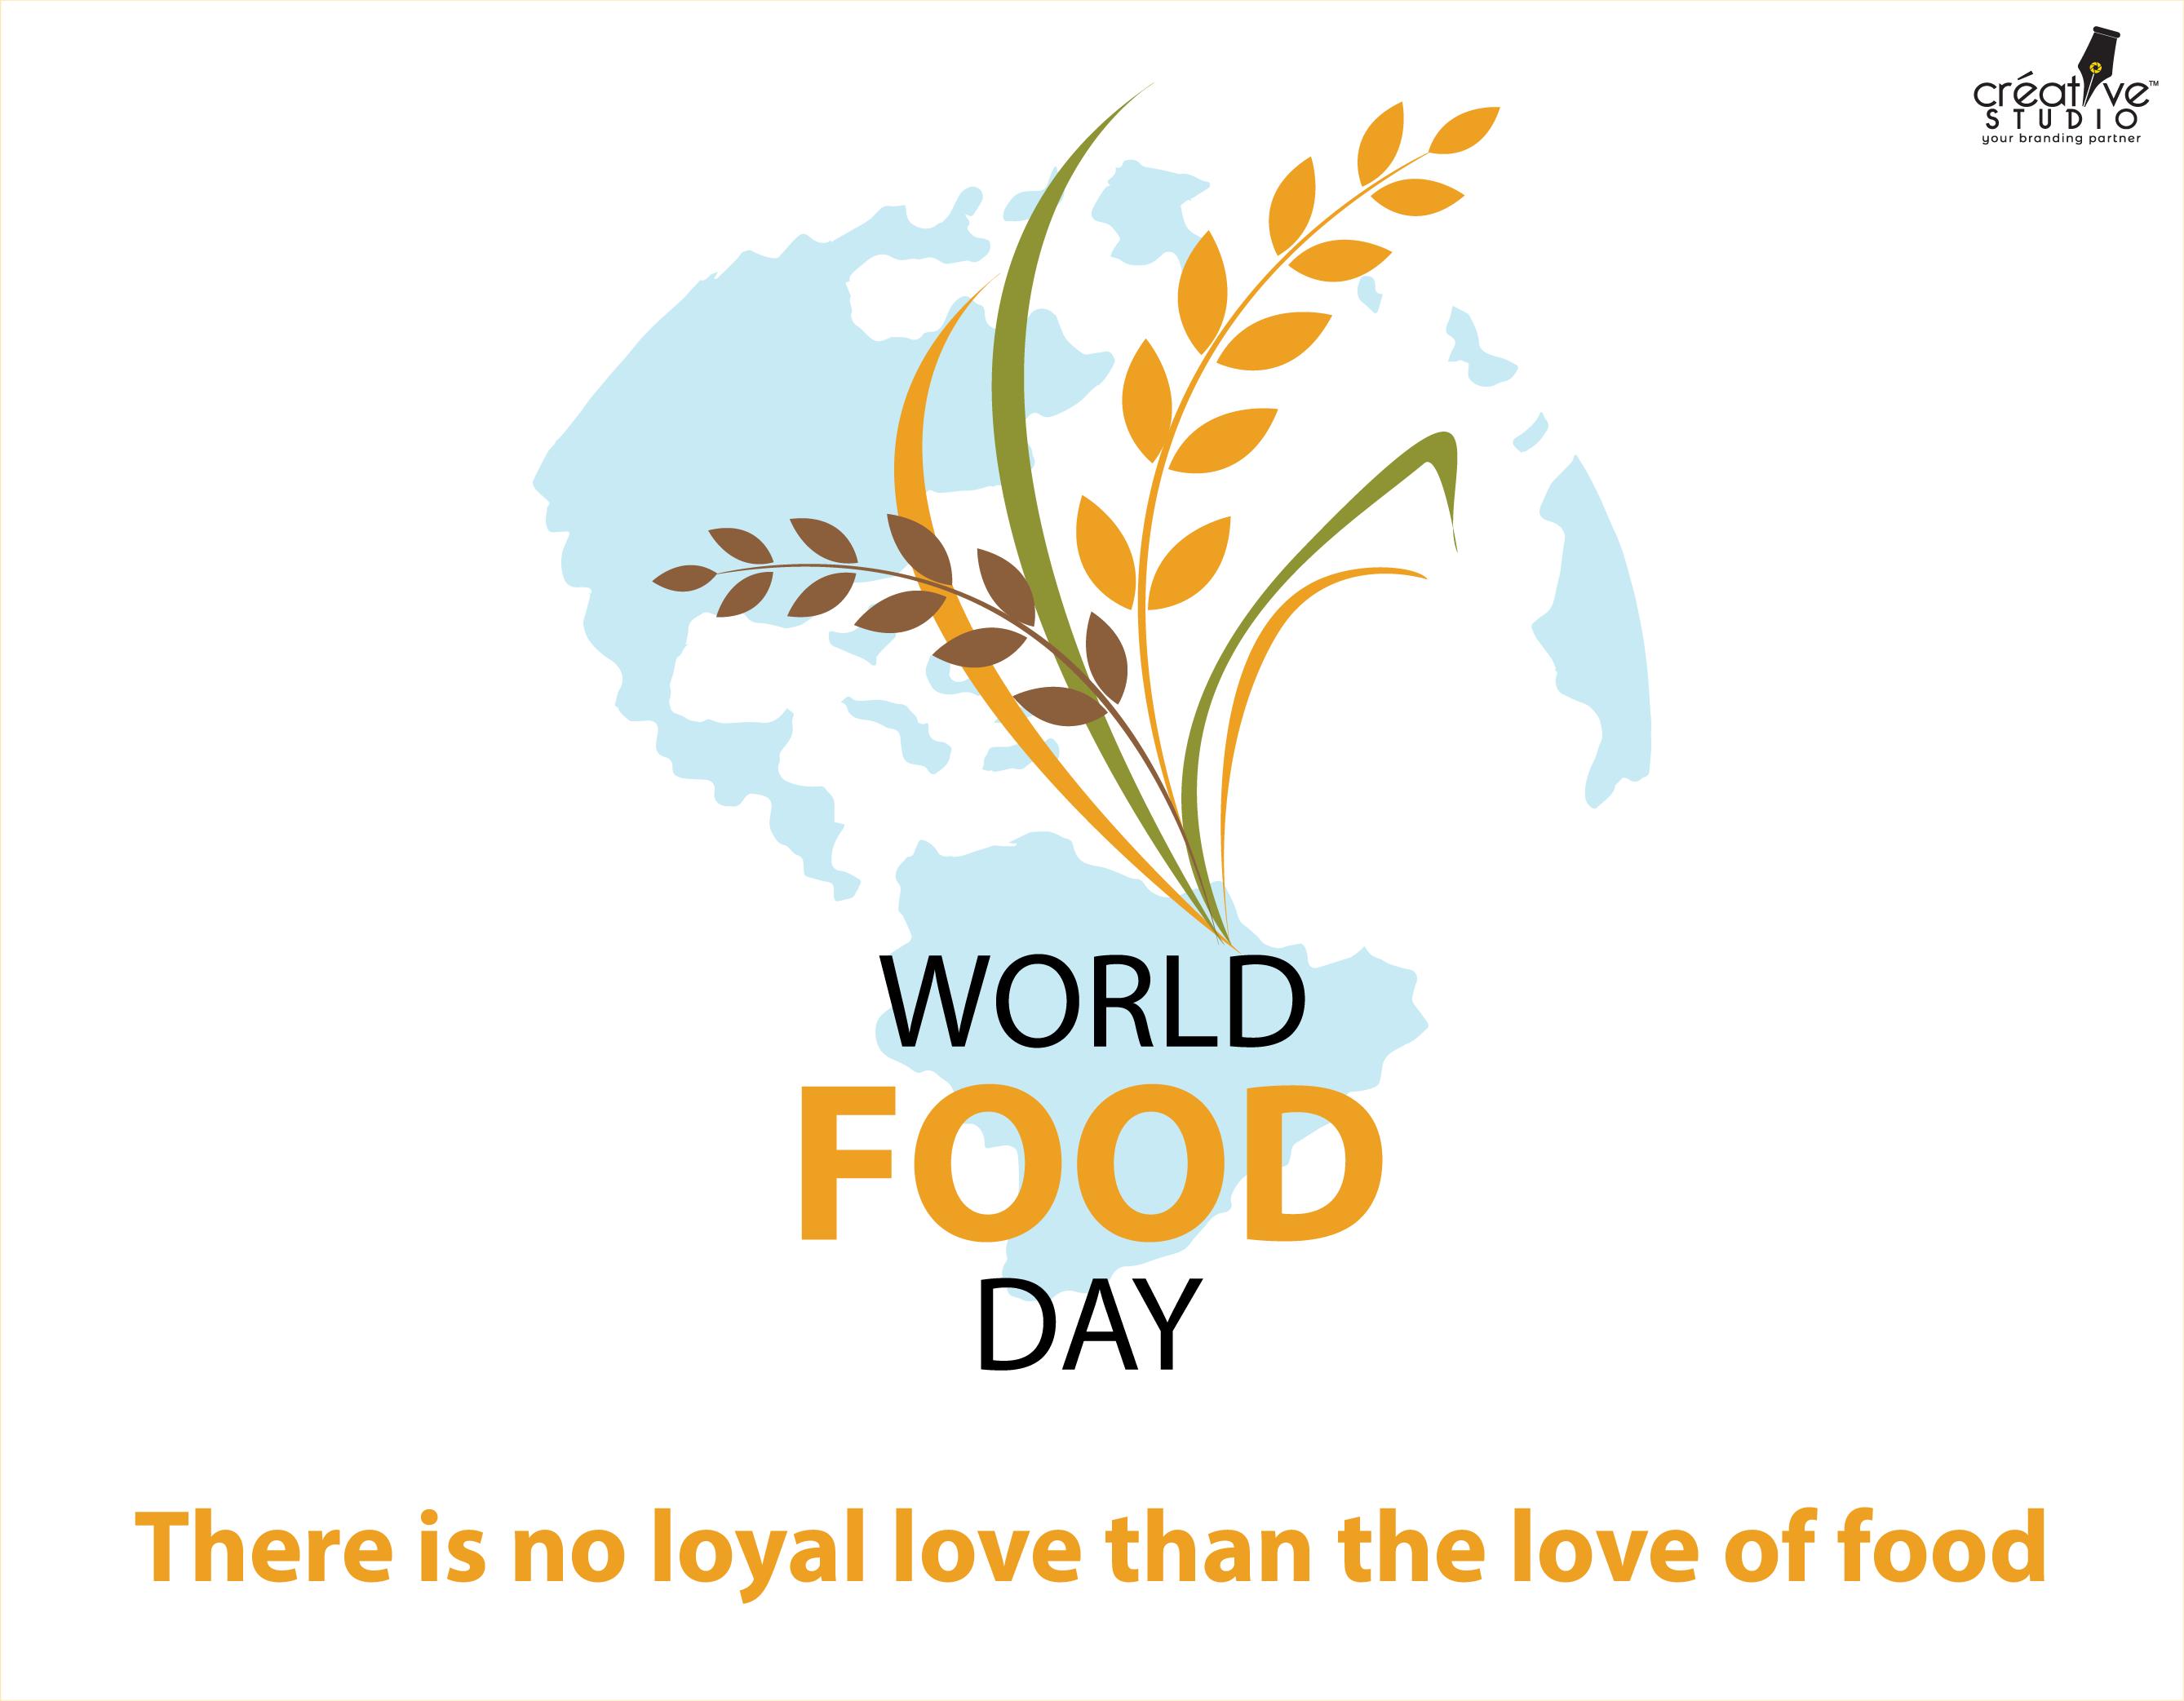 world food day 03 - World Food Day